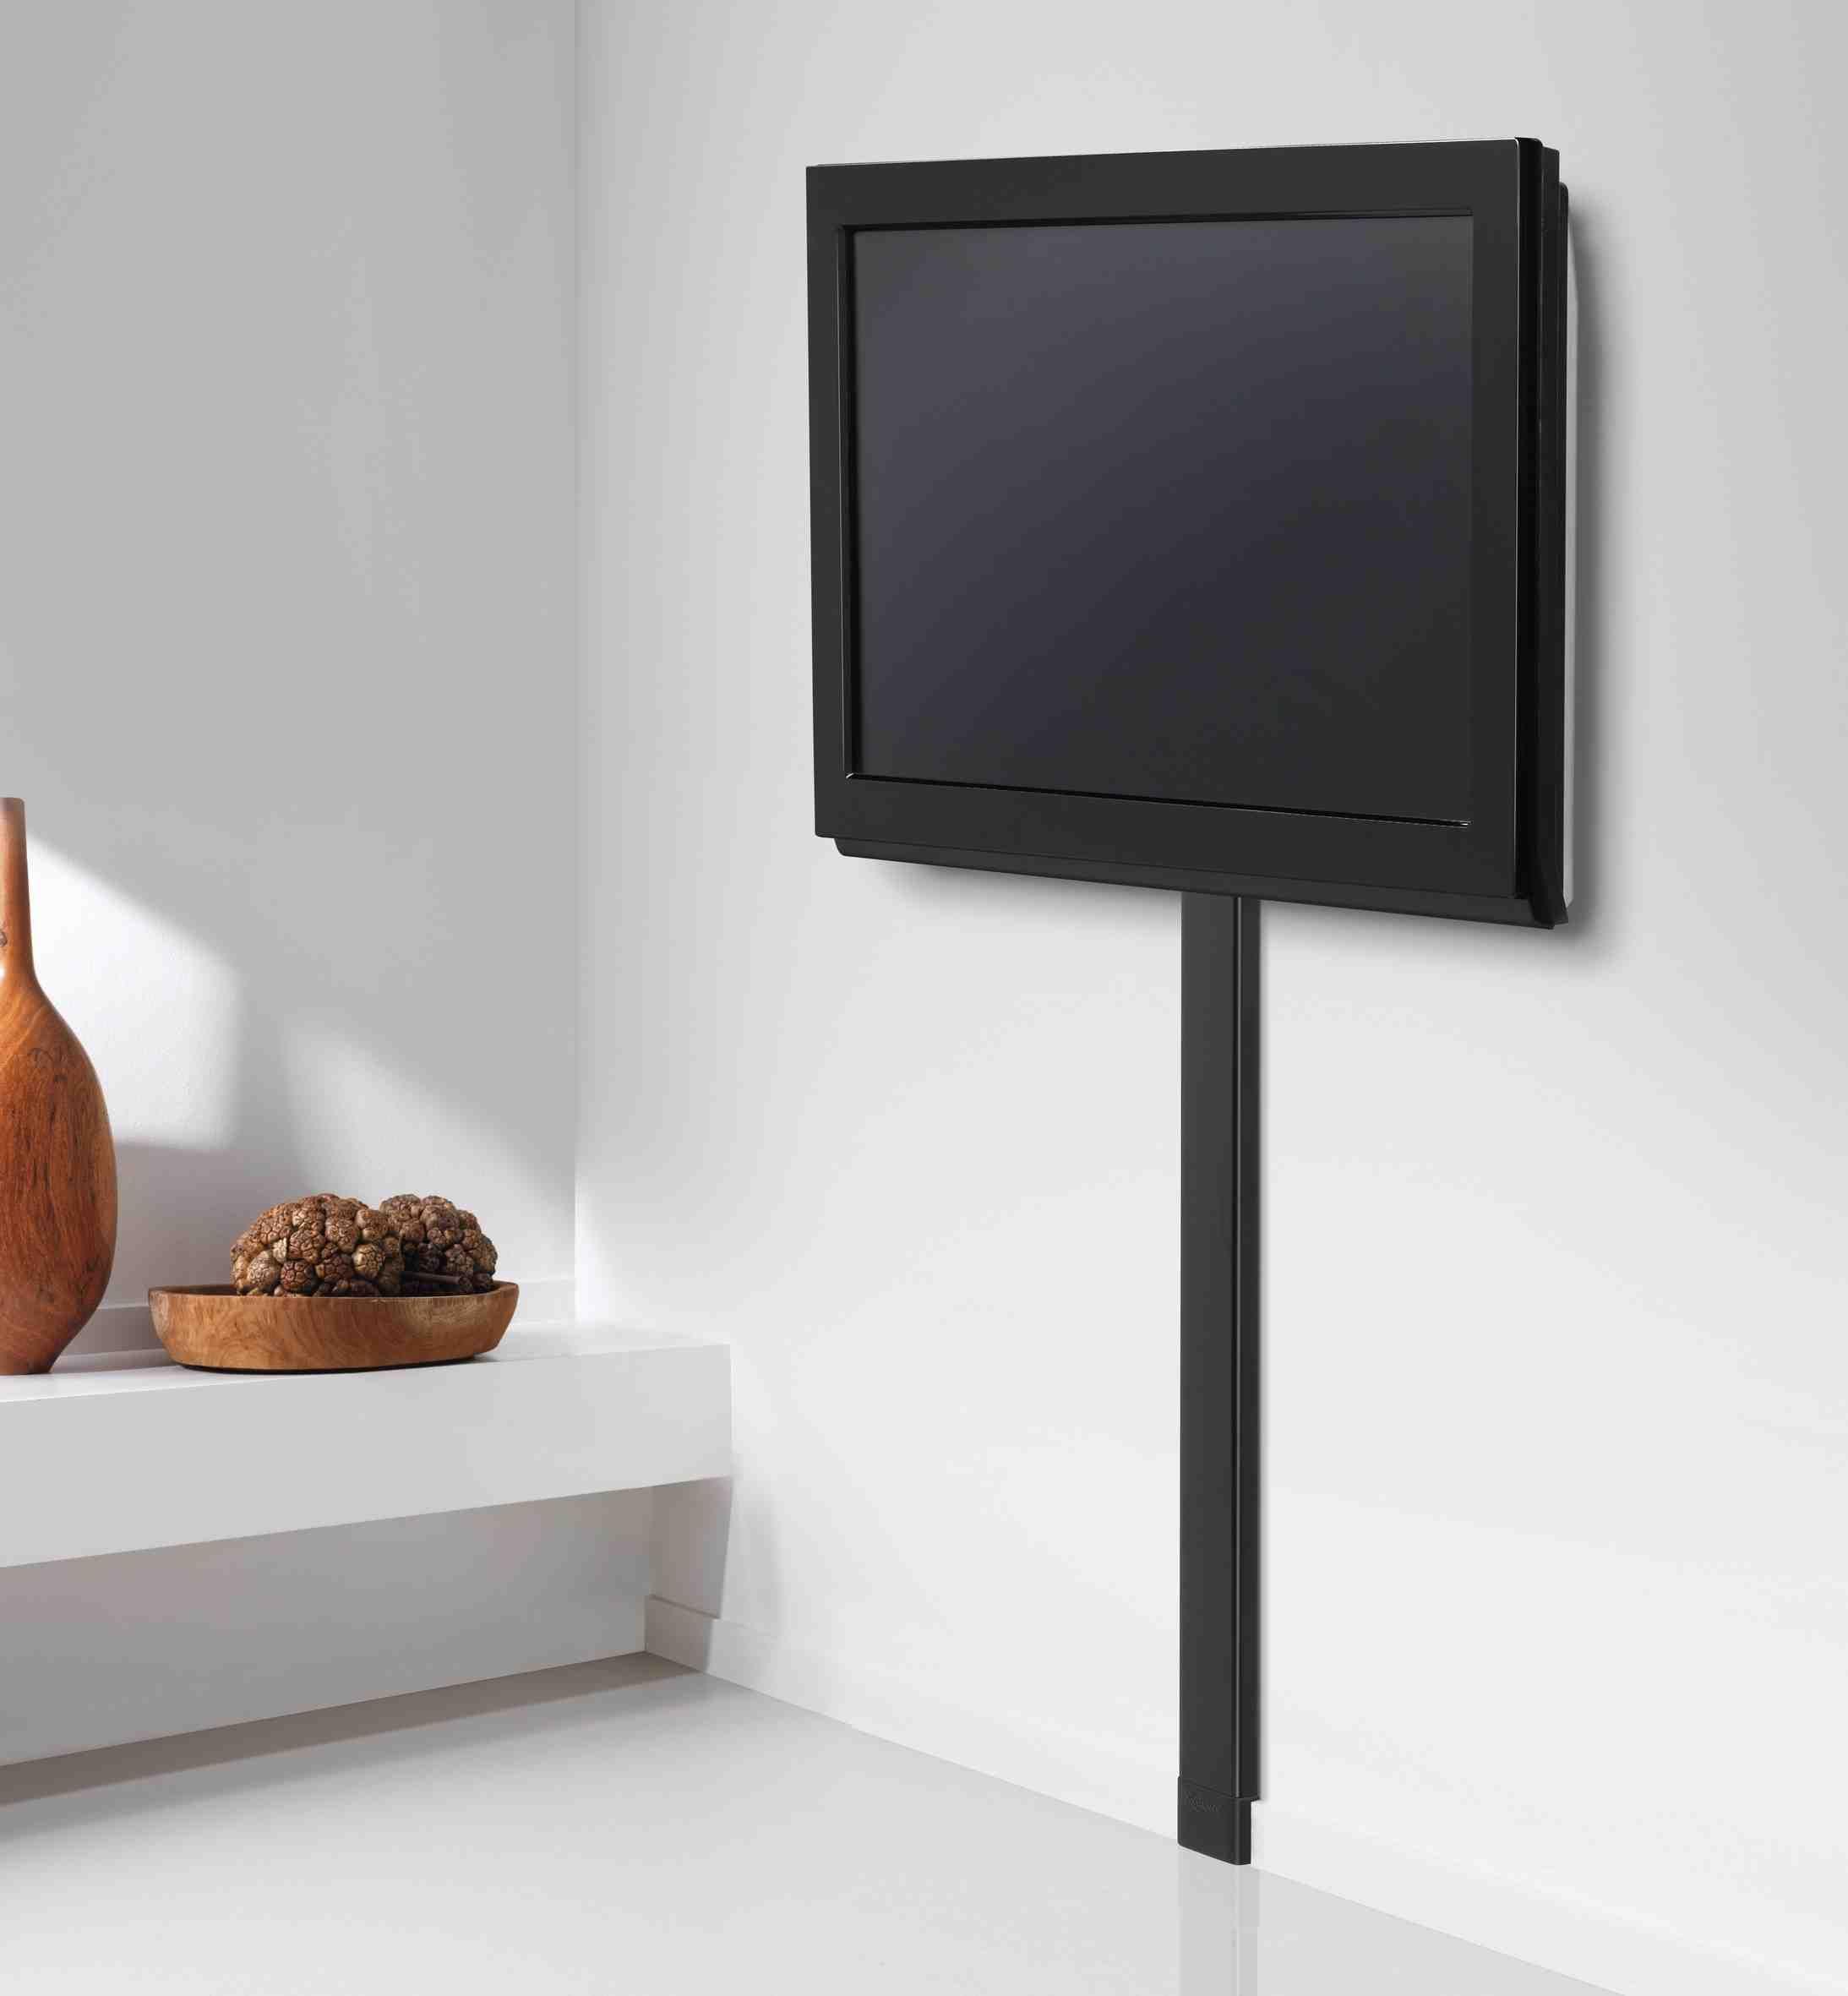 Wall Mount Tv Wire Cover Nastennyj Televizor Kreplenie